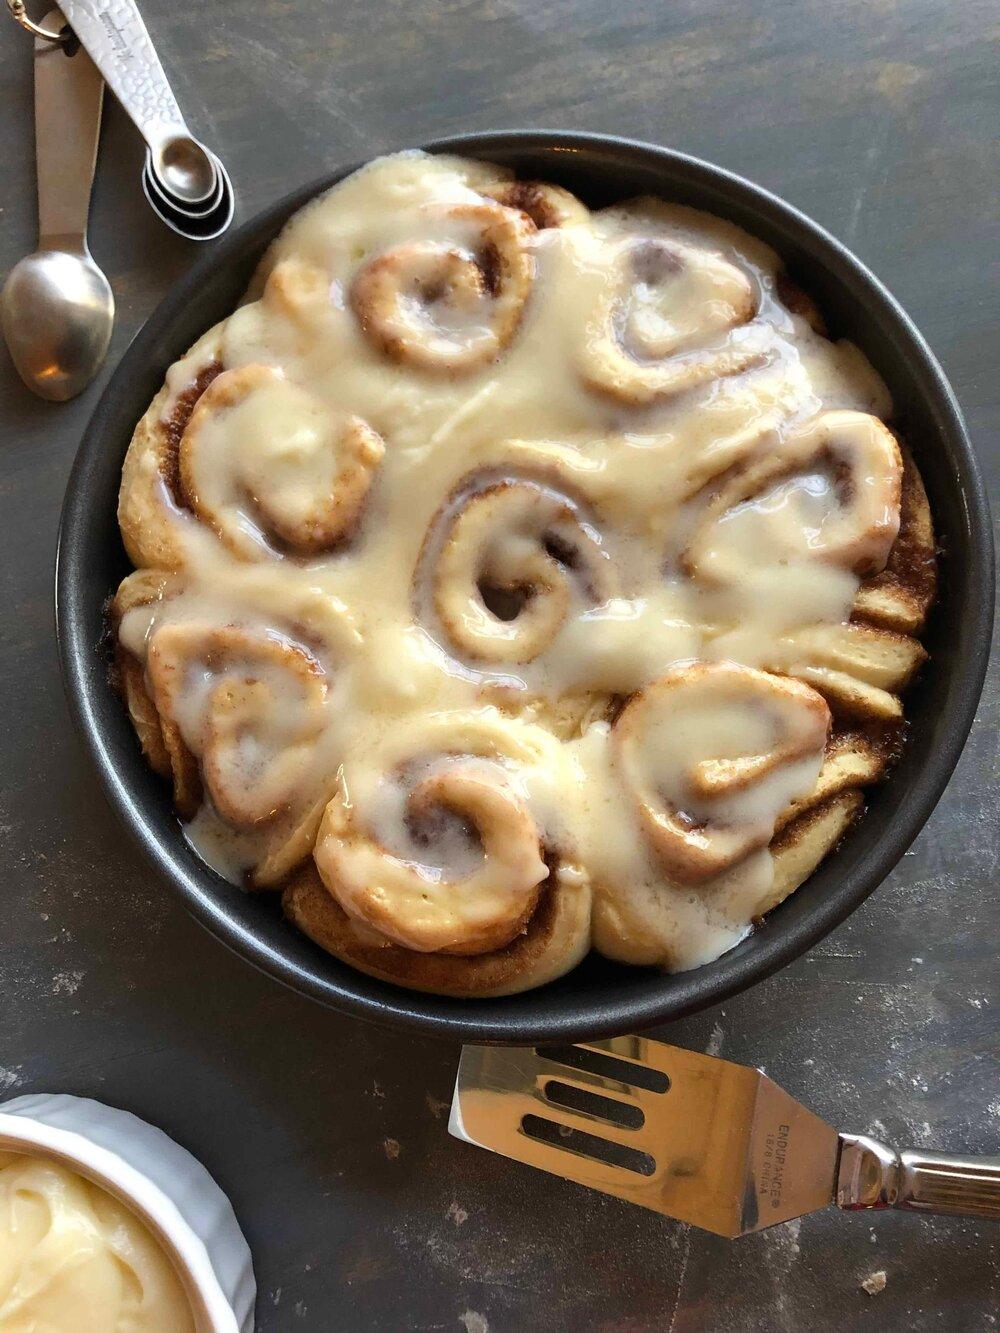 Missouri Girl Homemade Cinnamon Rolls with Vanilla Cream Icing. Missouri Girl Blog